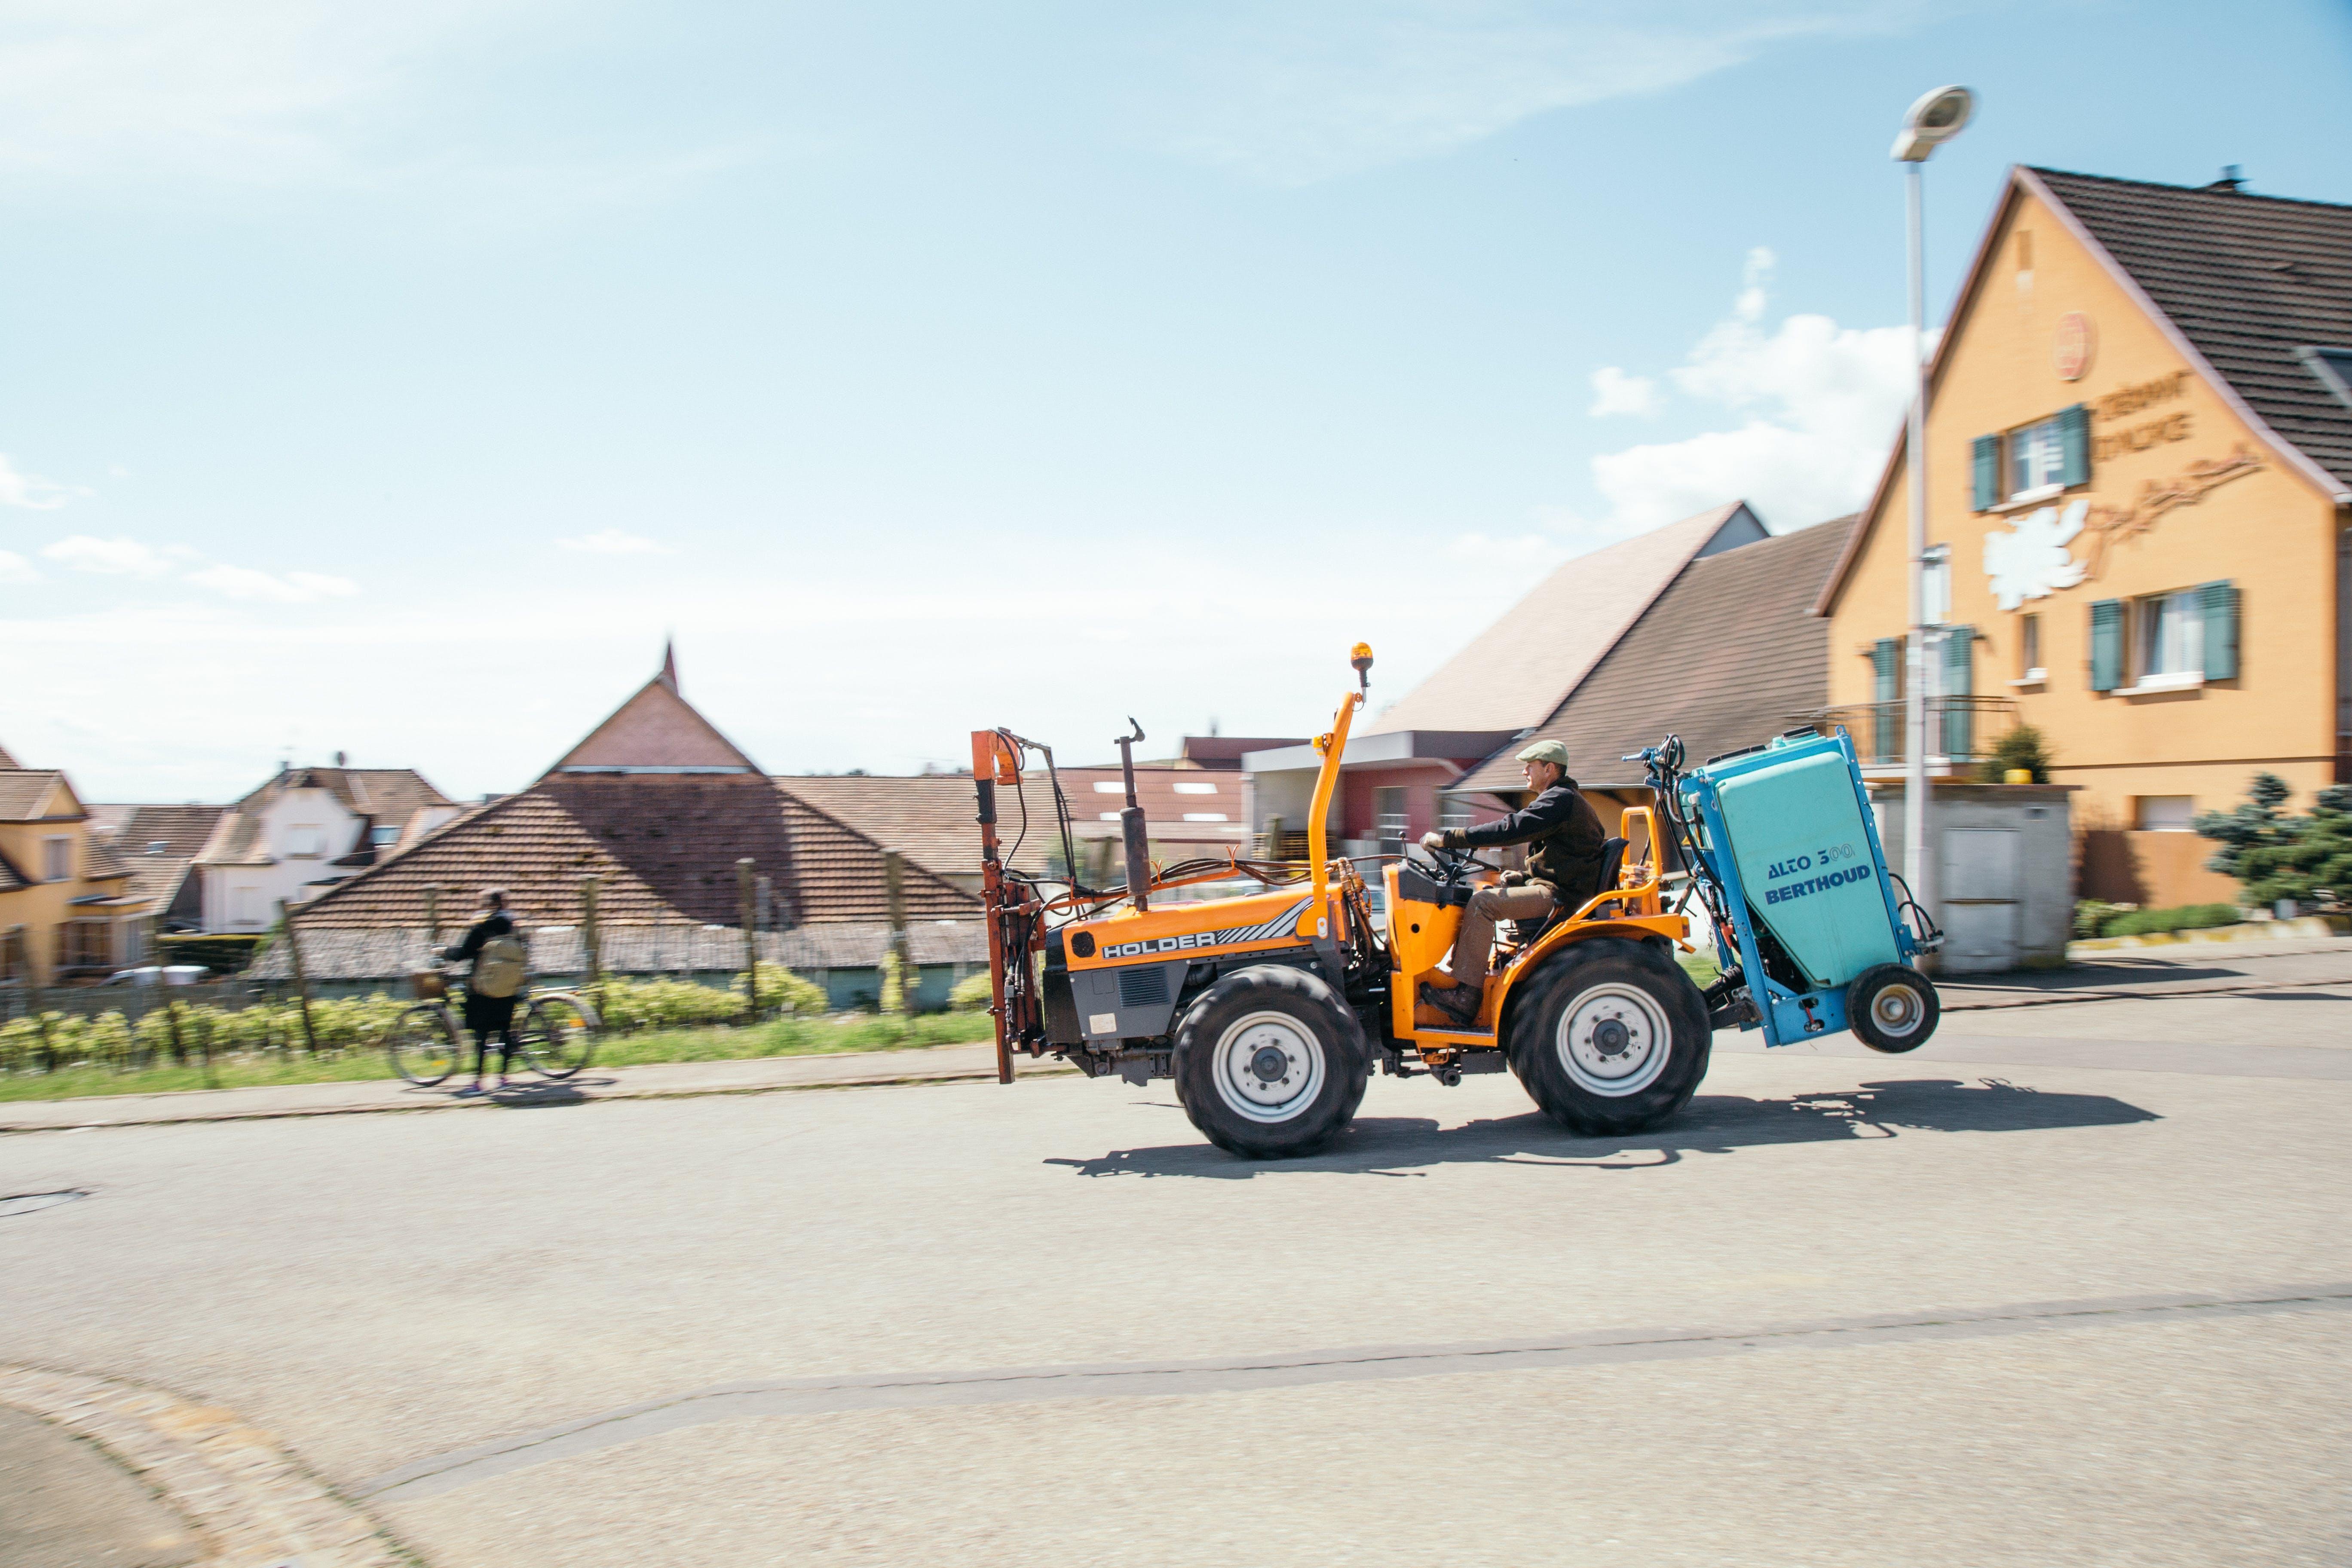 Man Riding on Yellow Heavy Equipment